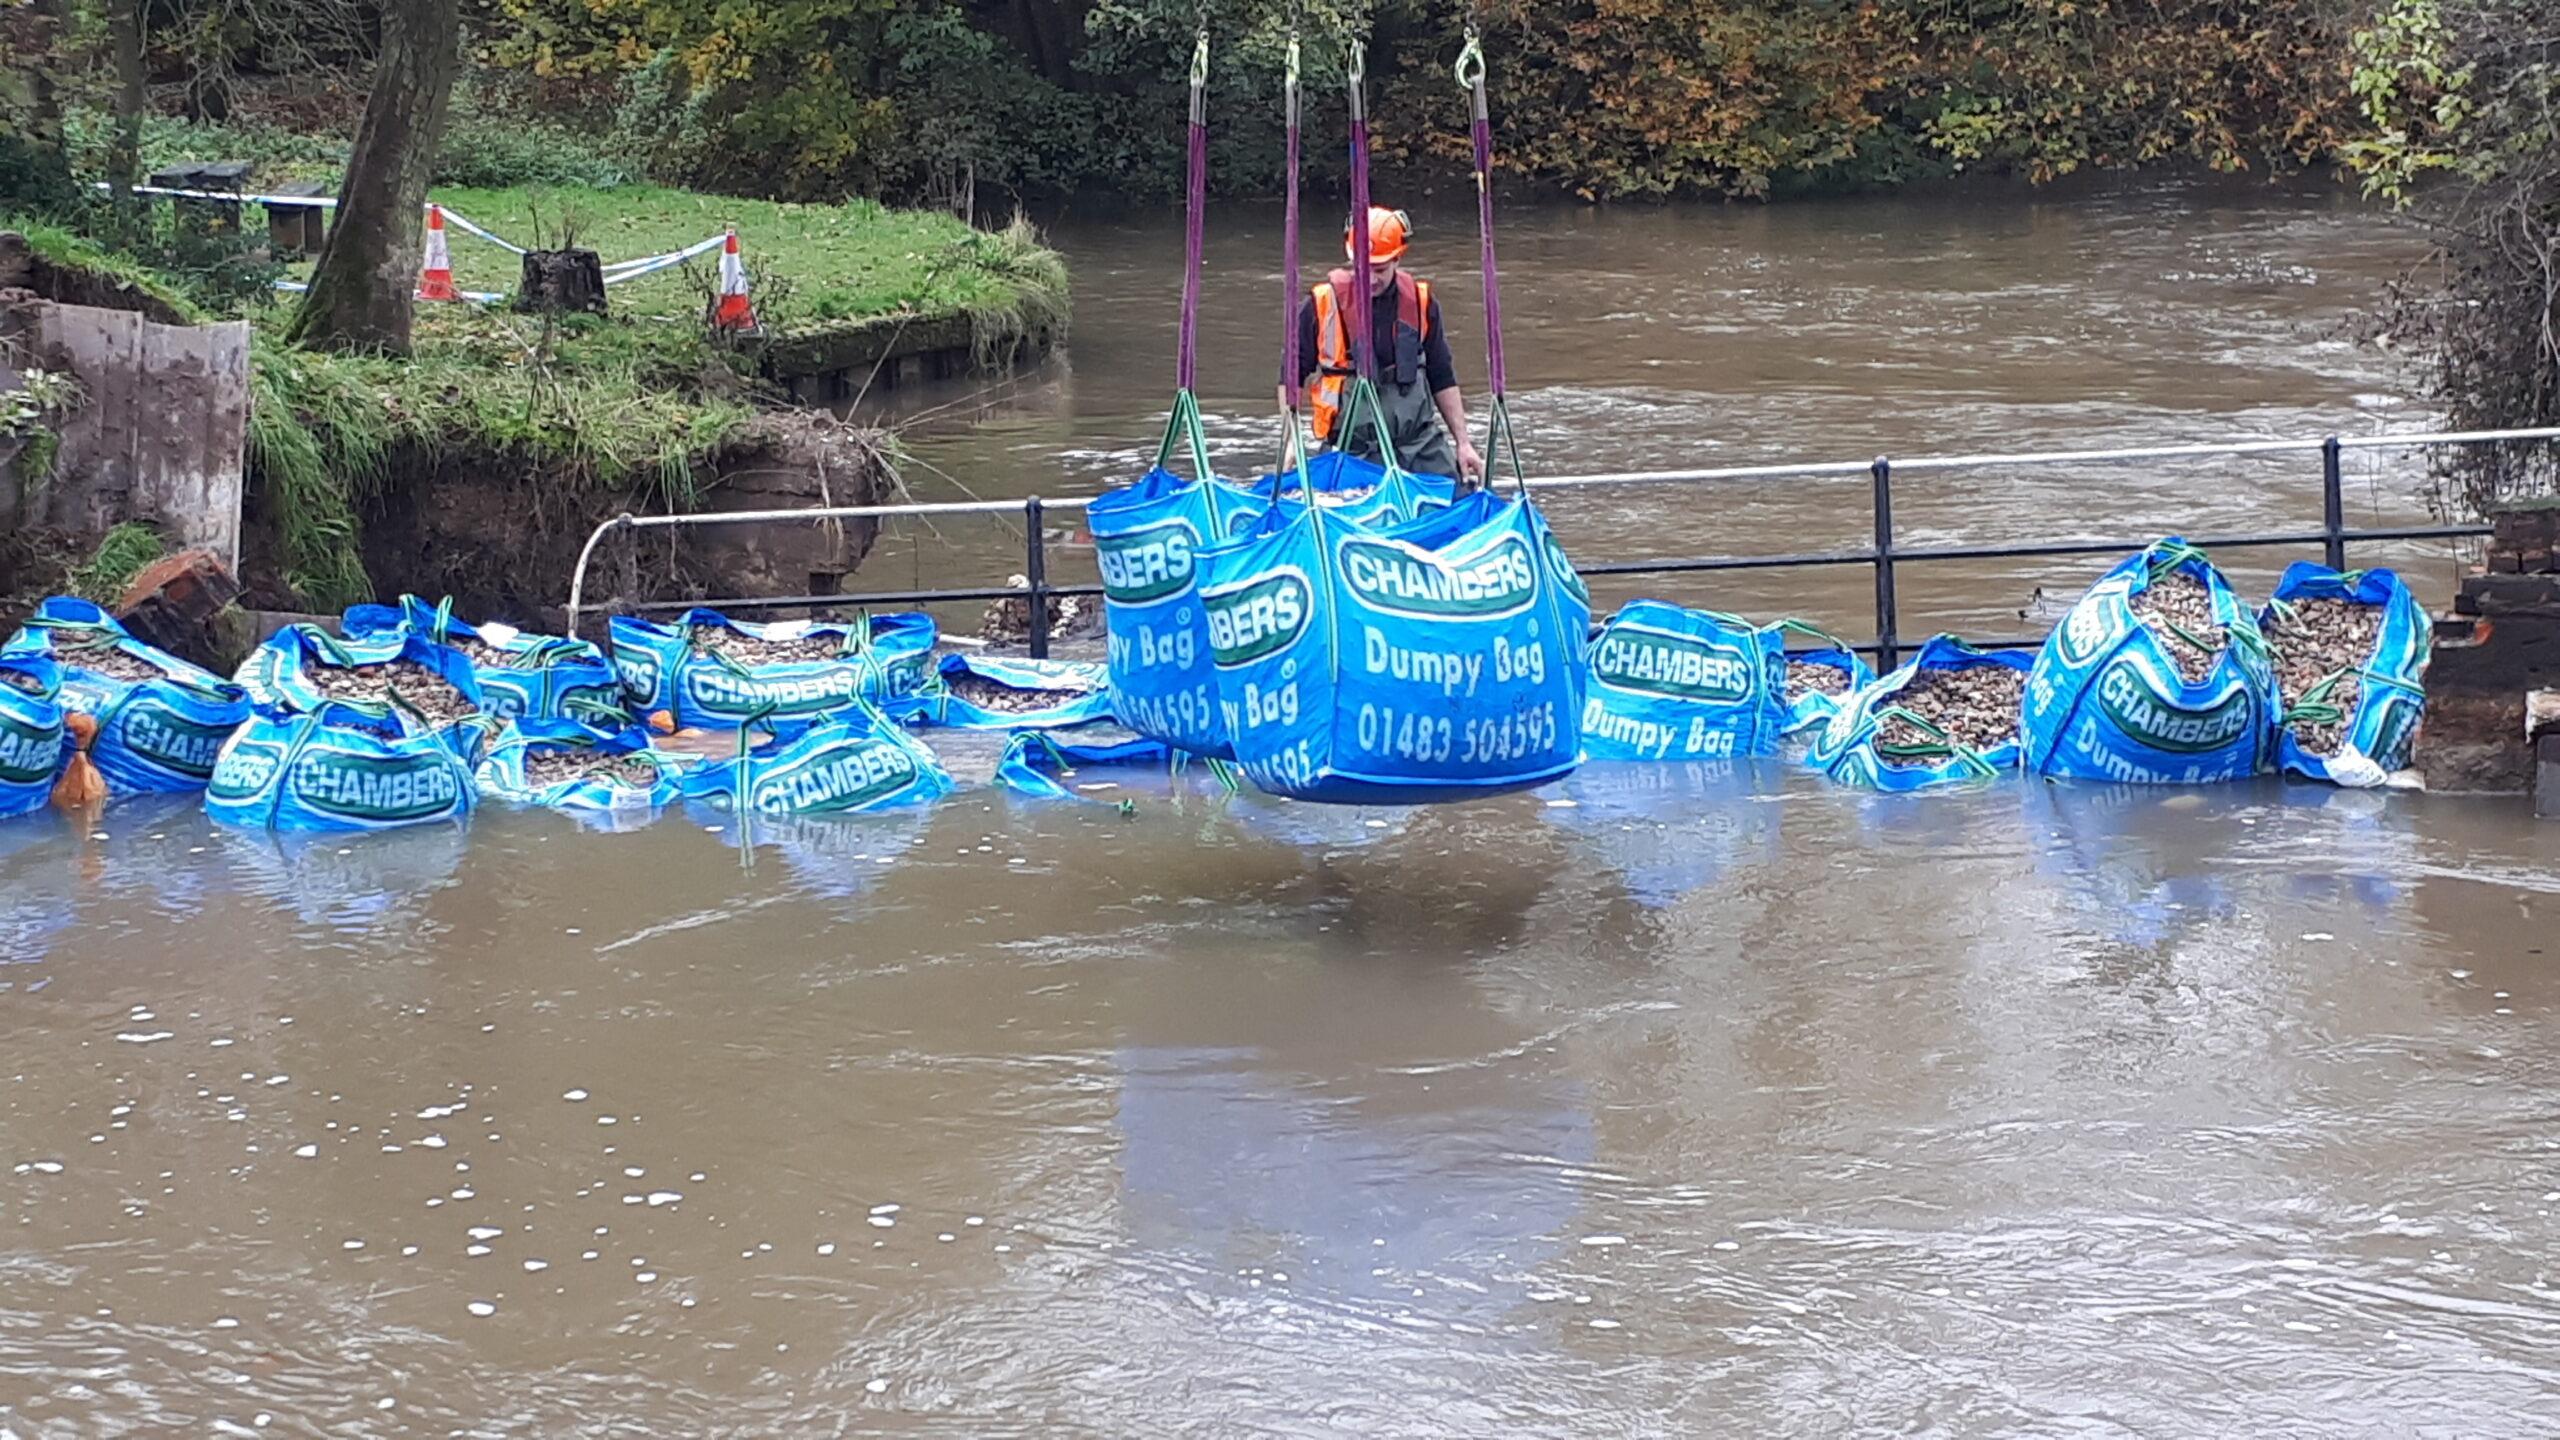 Chambers dumpy bags used to block flood